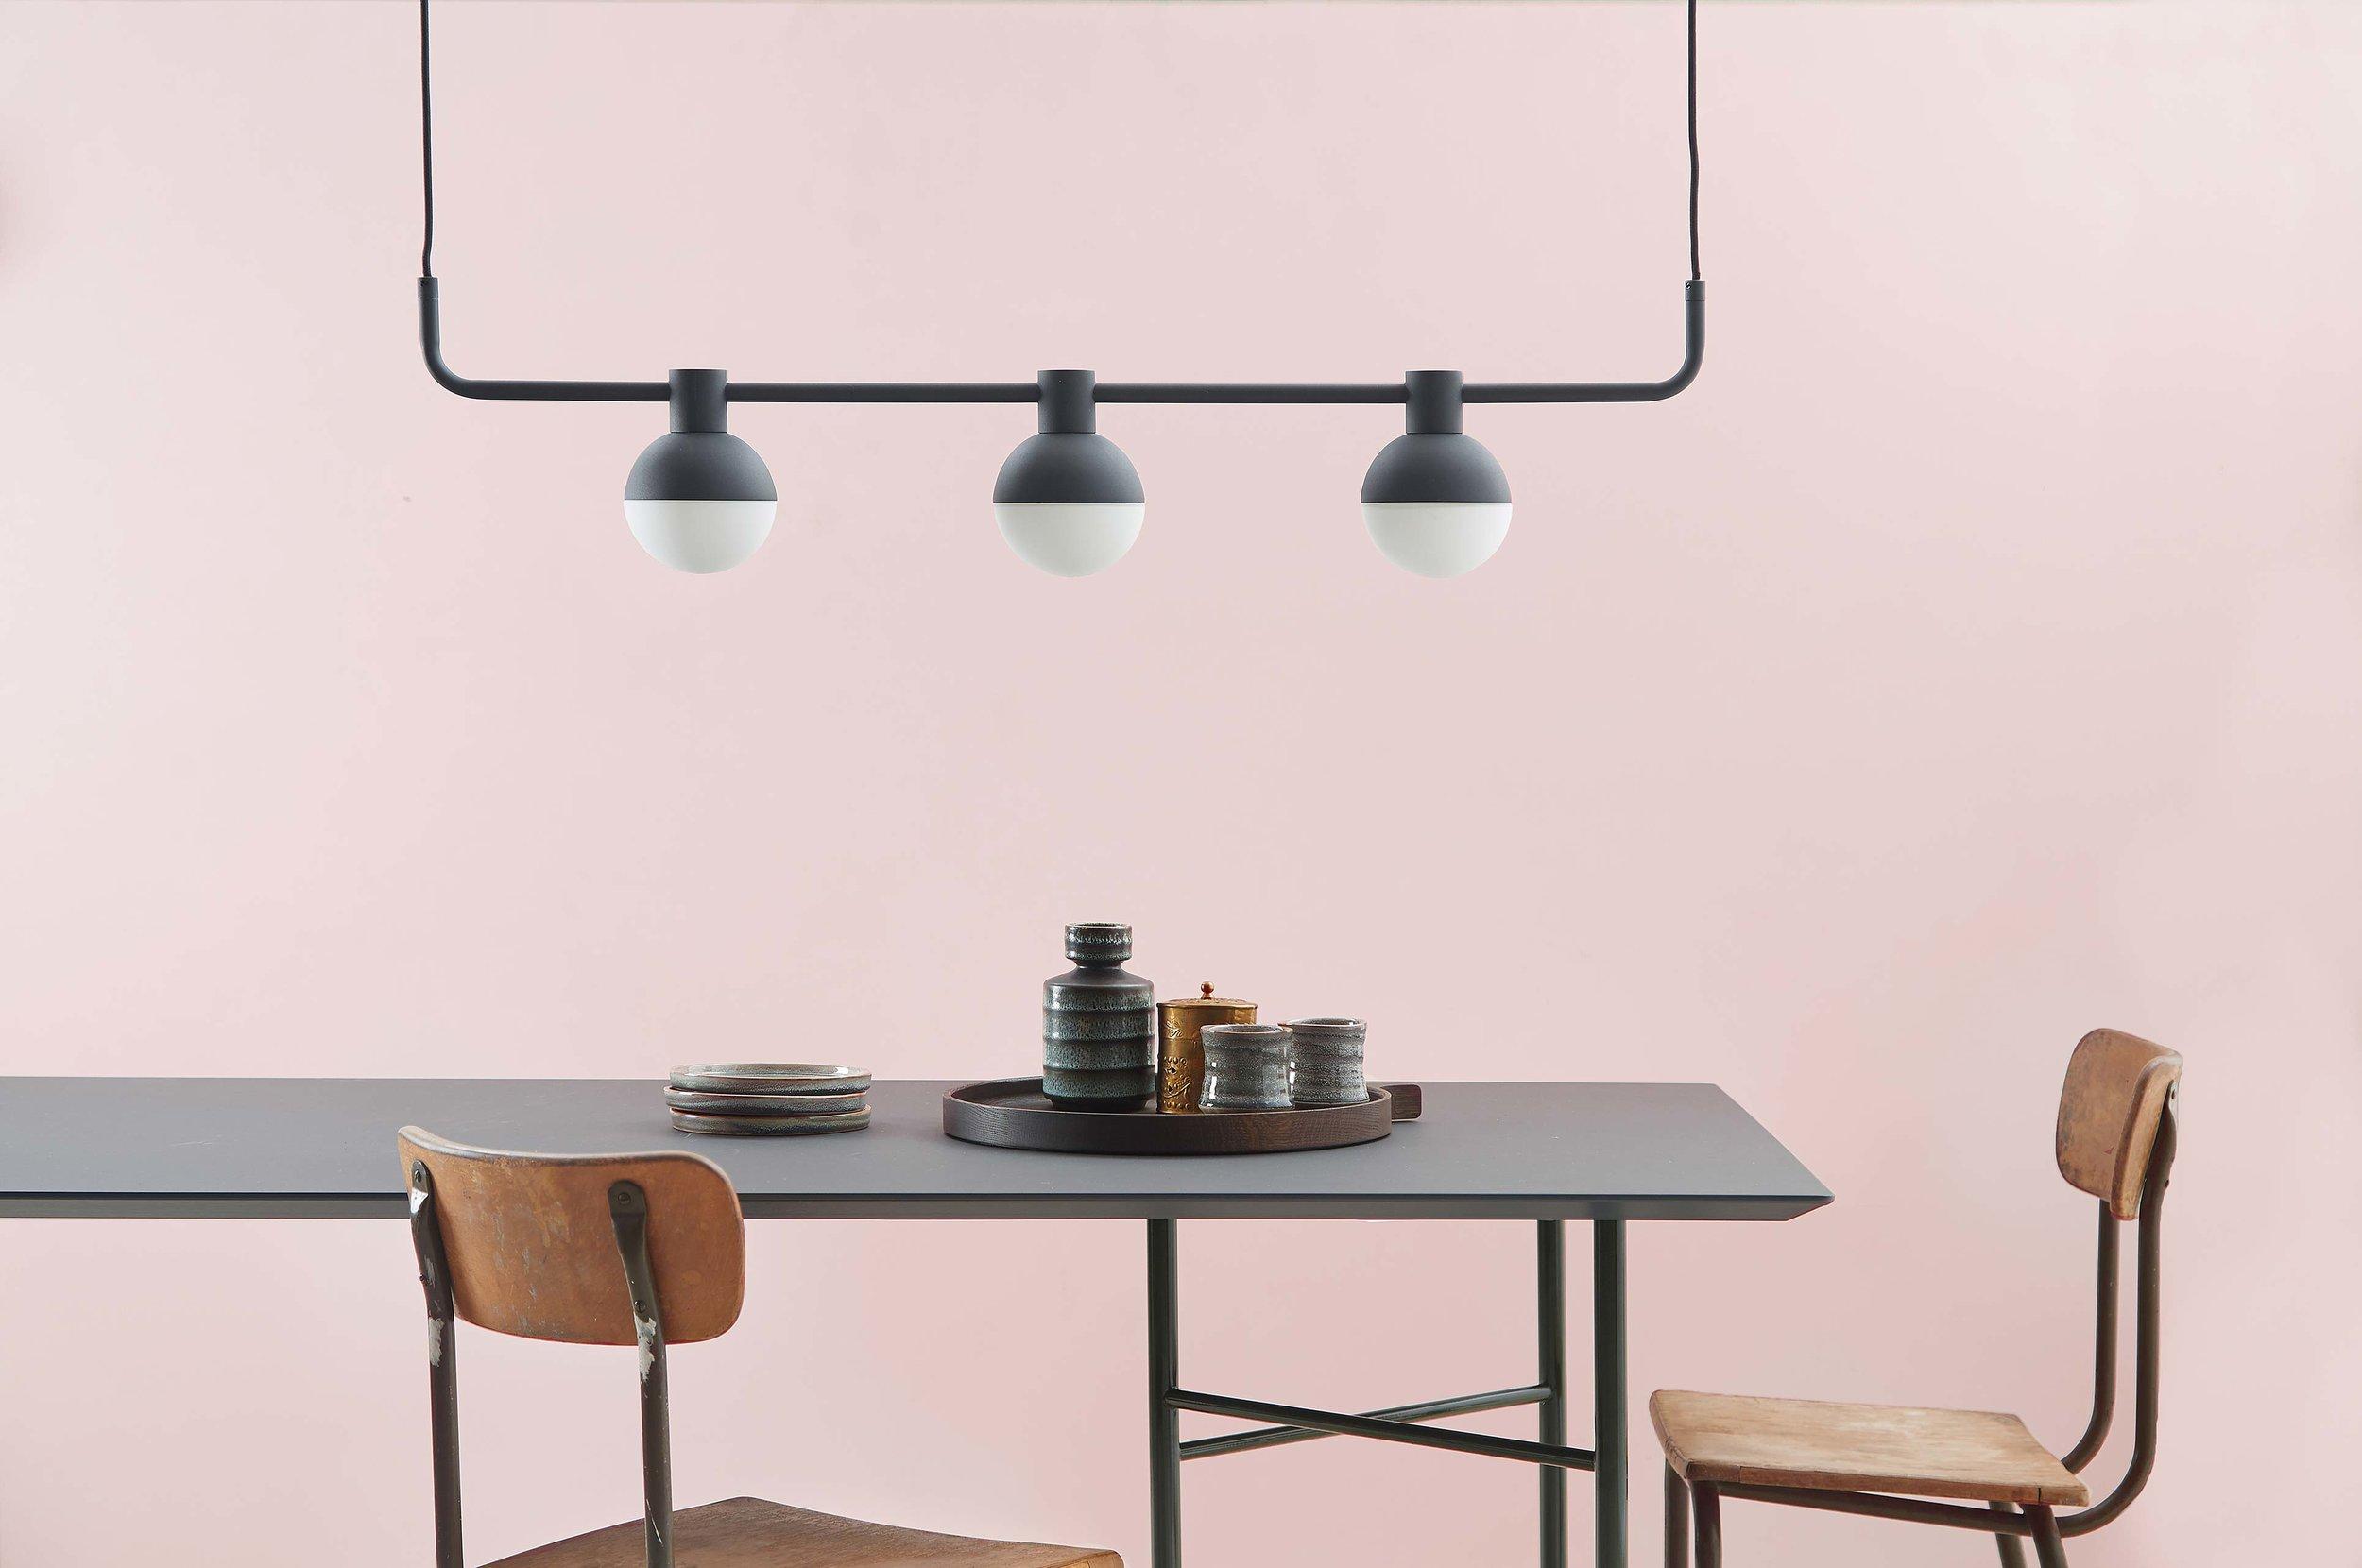 Fabian-chandelier-horizontal-structure-black---lifestyle-Horsens-studio-1506.jpg